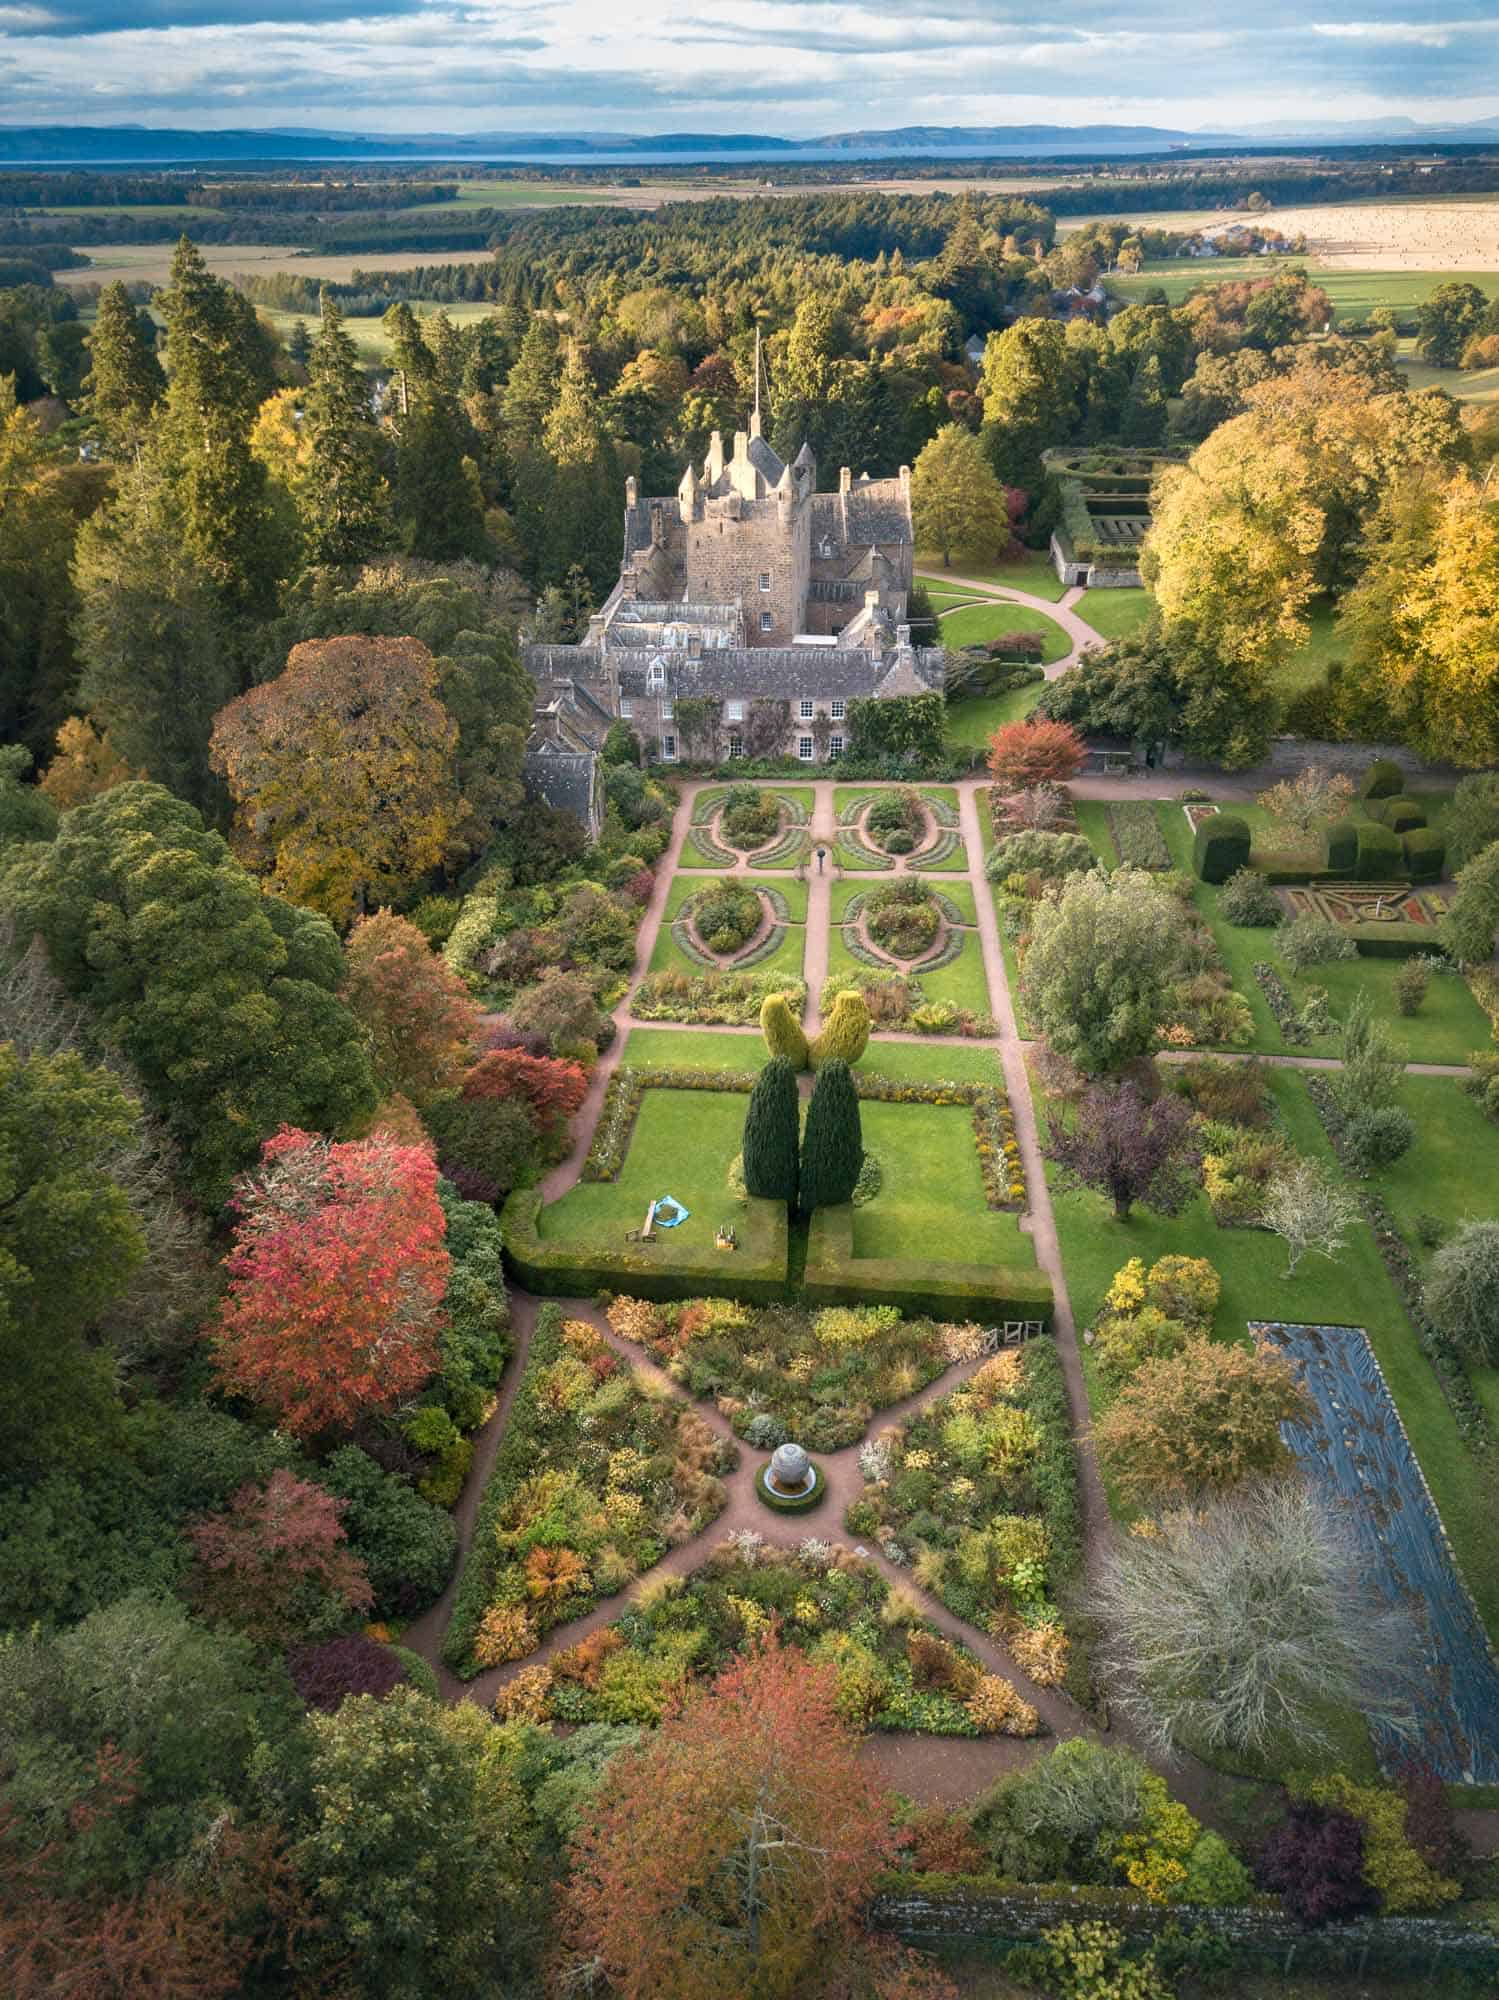 The impressive Cawdor Castle and gardens at golden hour.